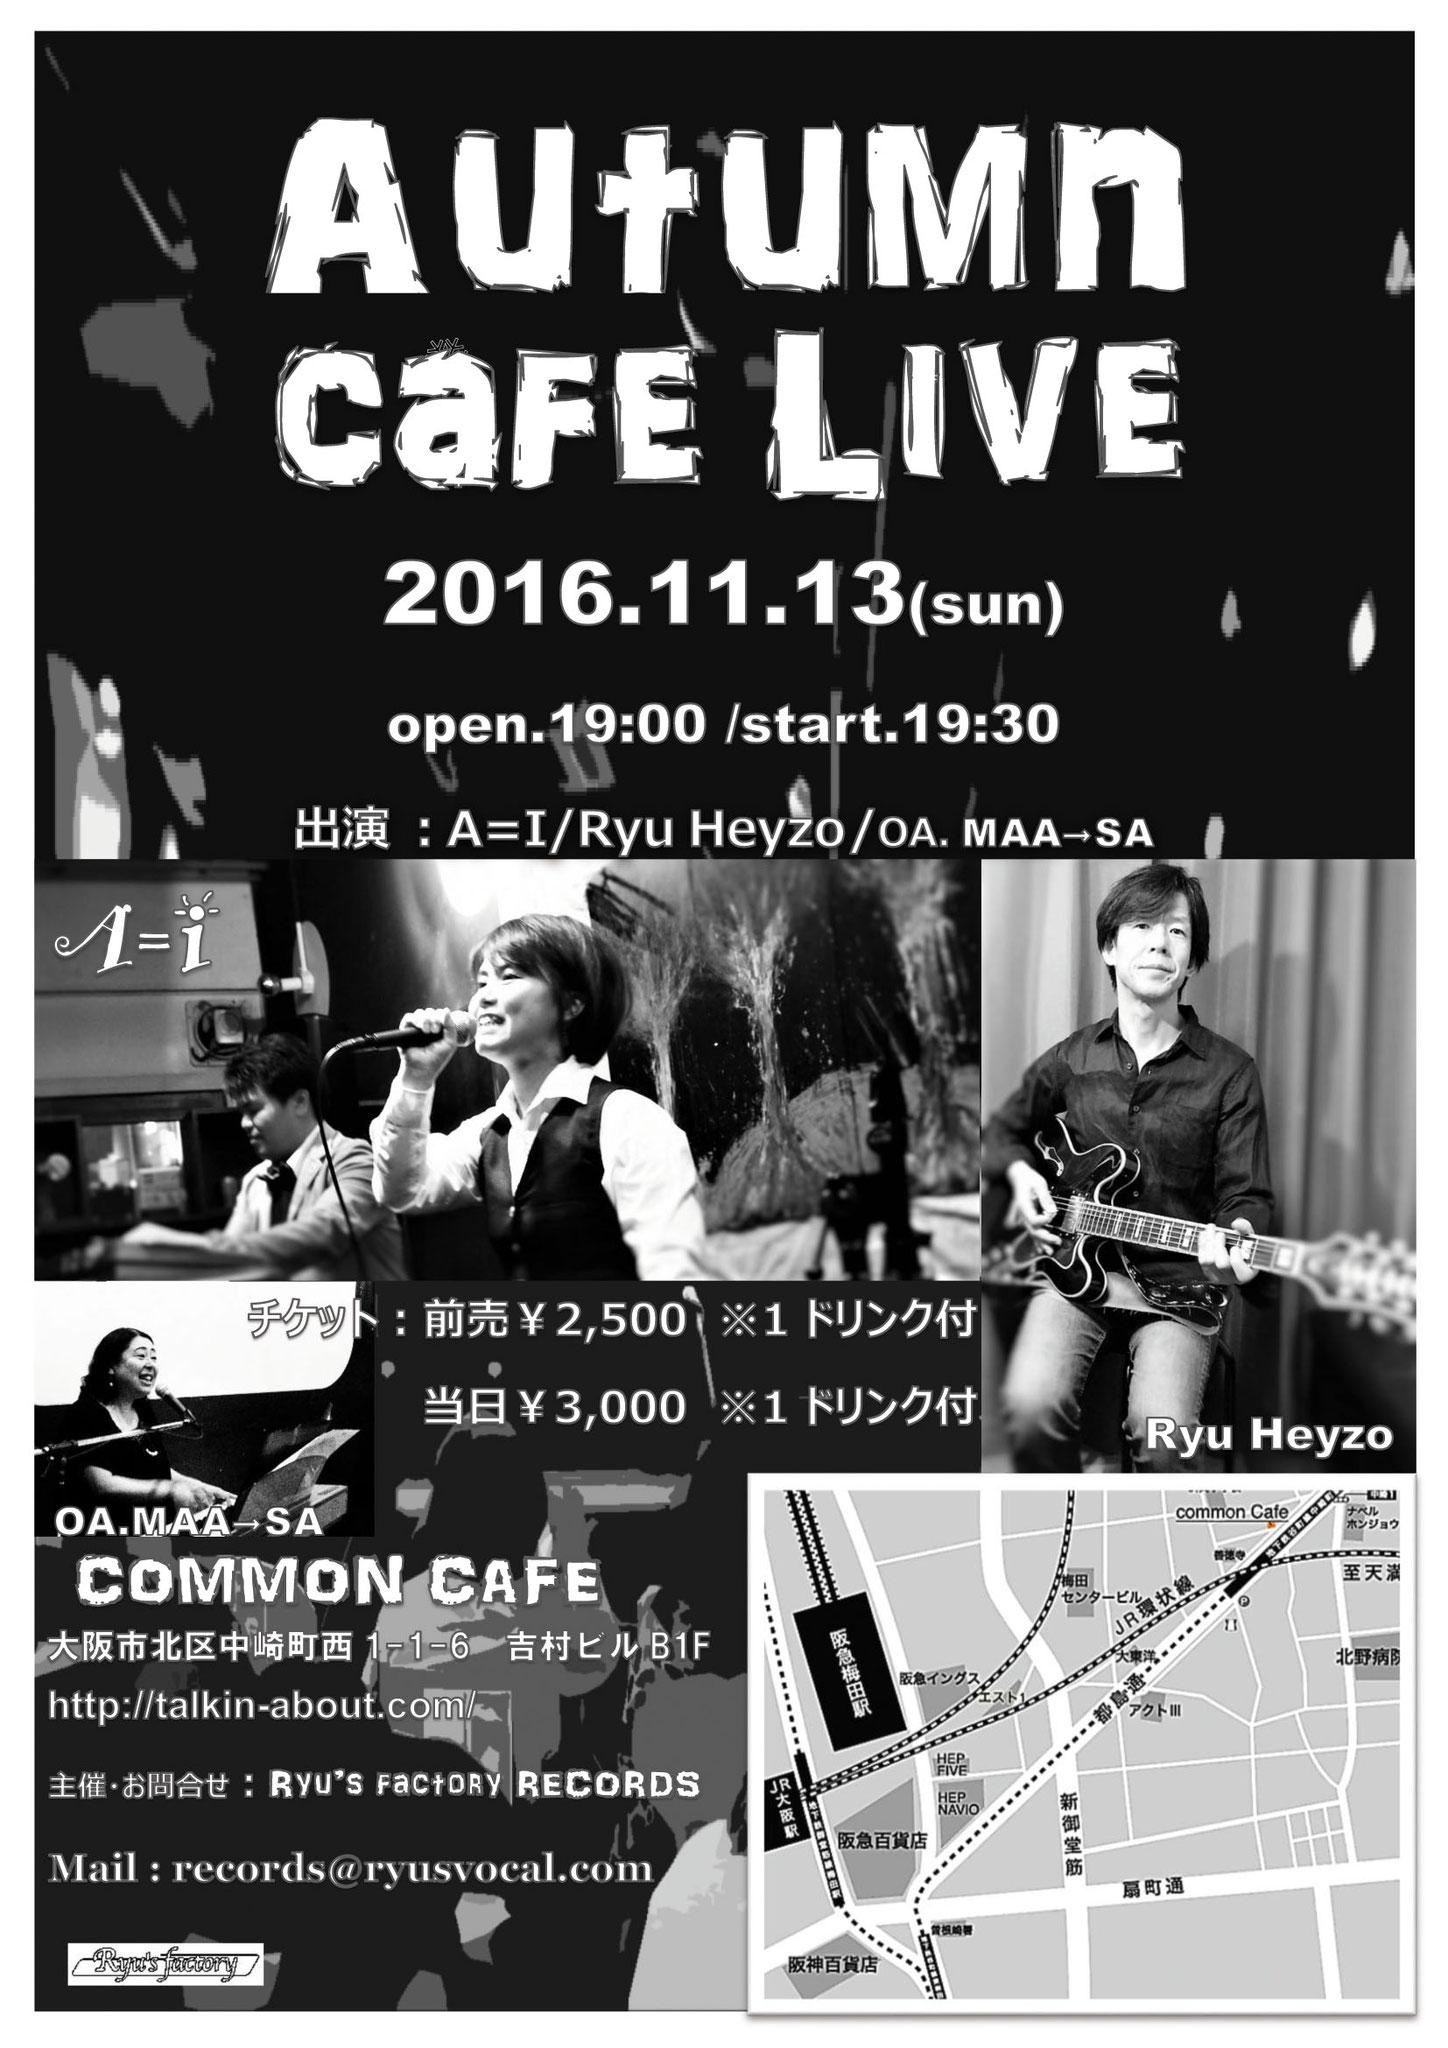 The Autumn Cafe LIVE